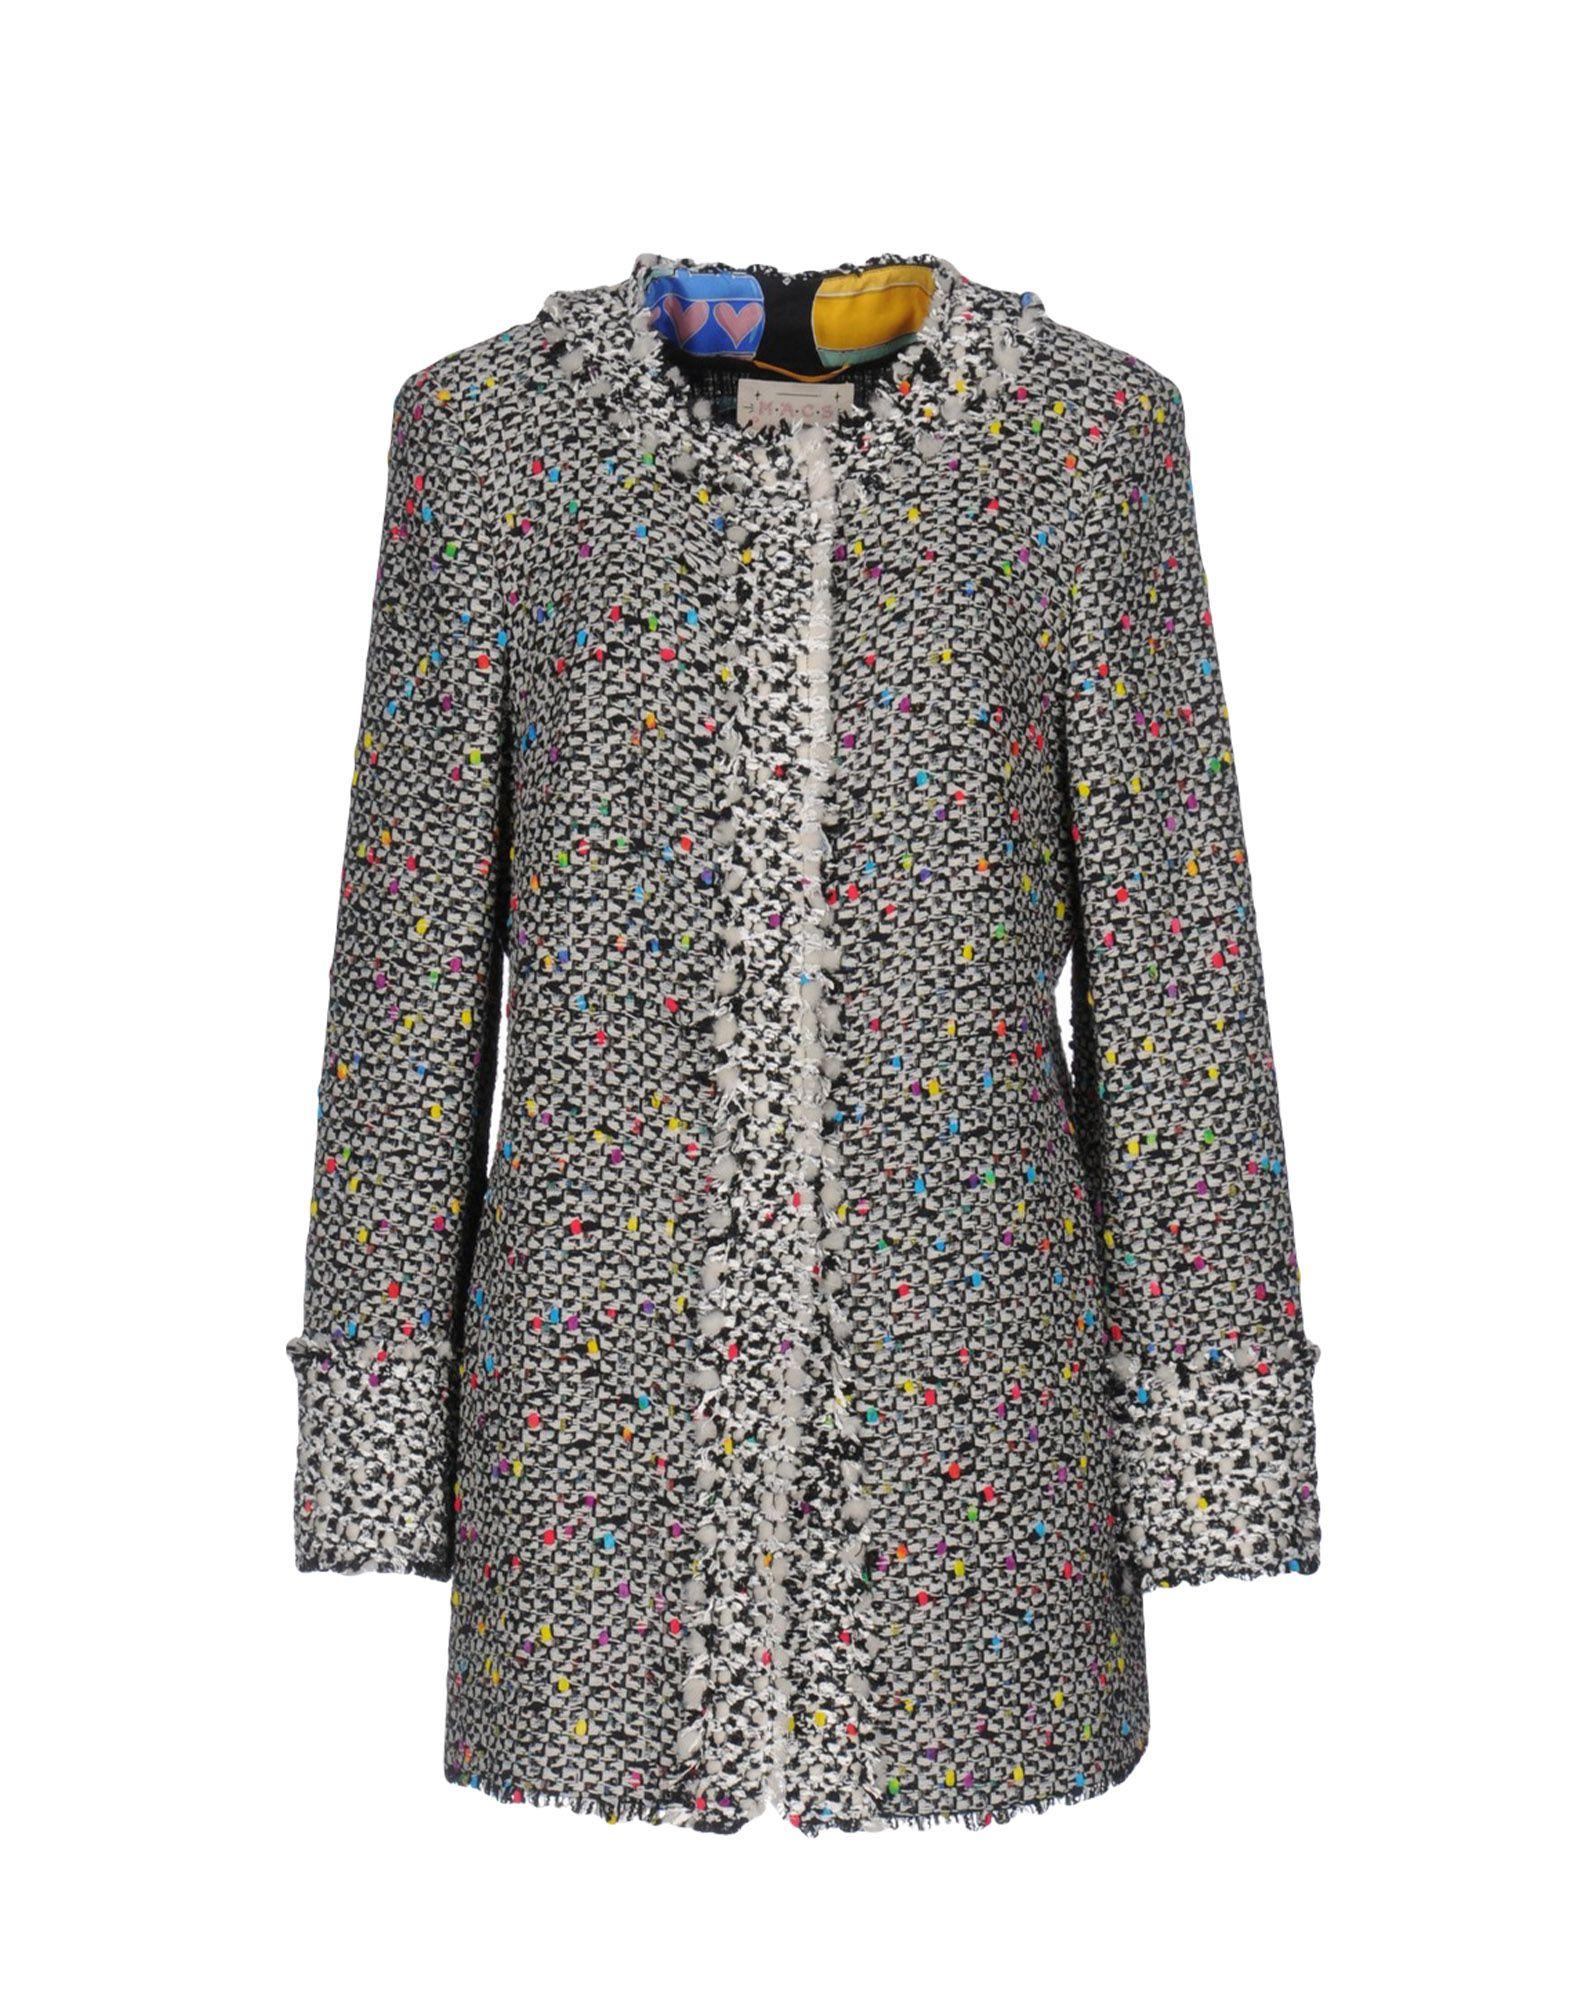 MAISON COMMON Легкое пальто купить common interface на самсунг